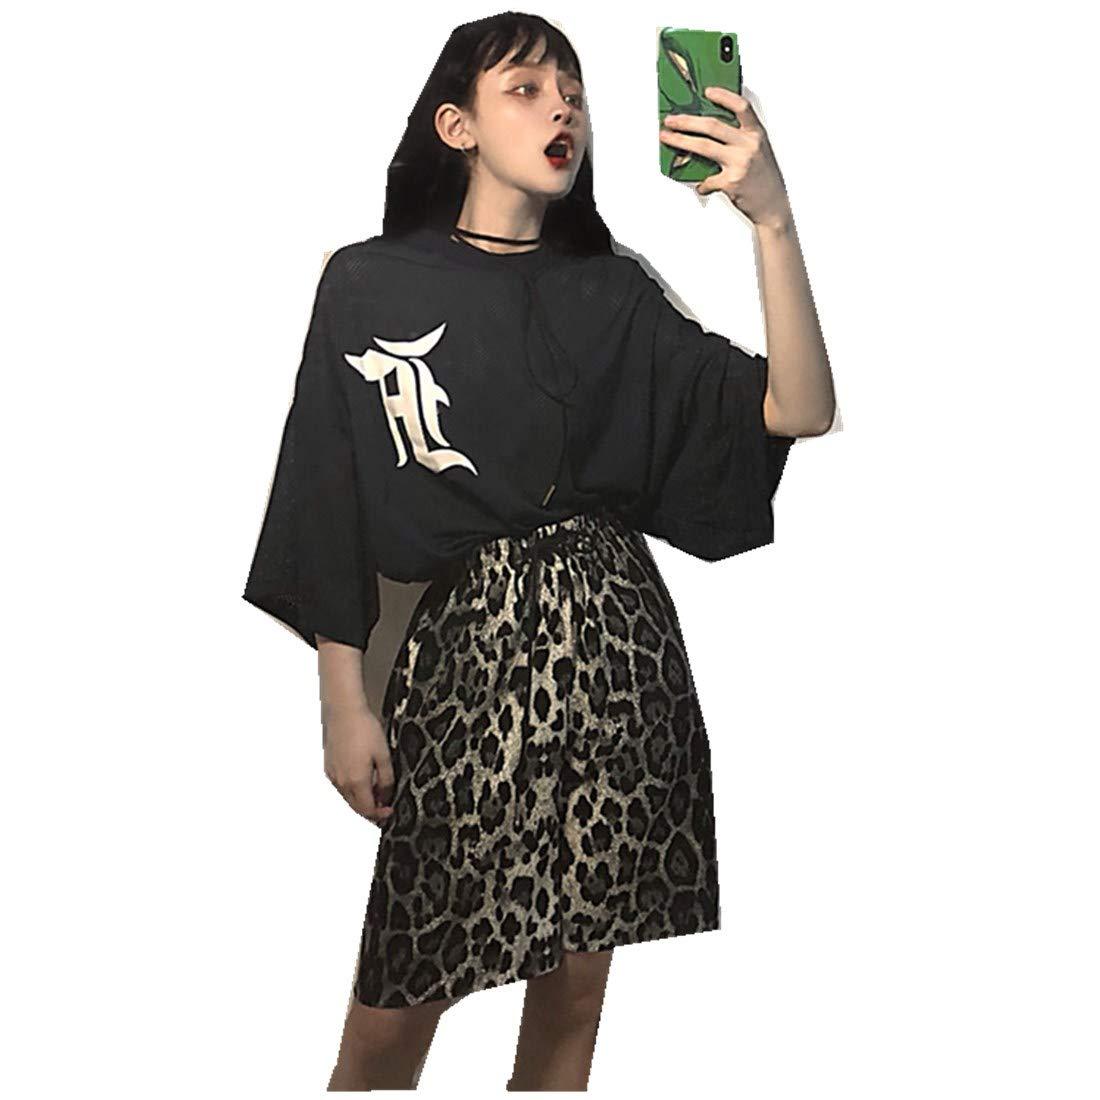 MV Summer Women's Suit Korean Version Loose Printed Mesh T-Shirt + Leopard Shorts